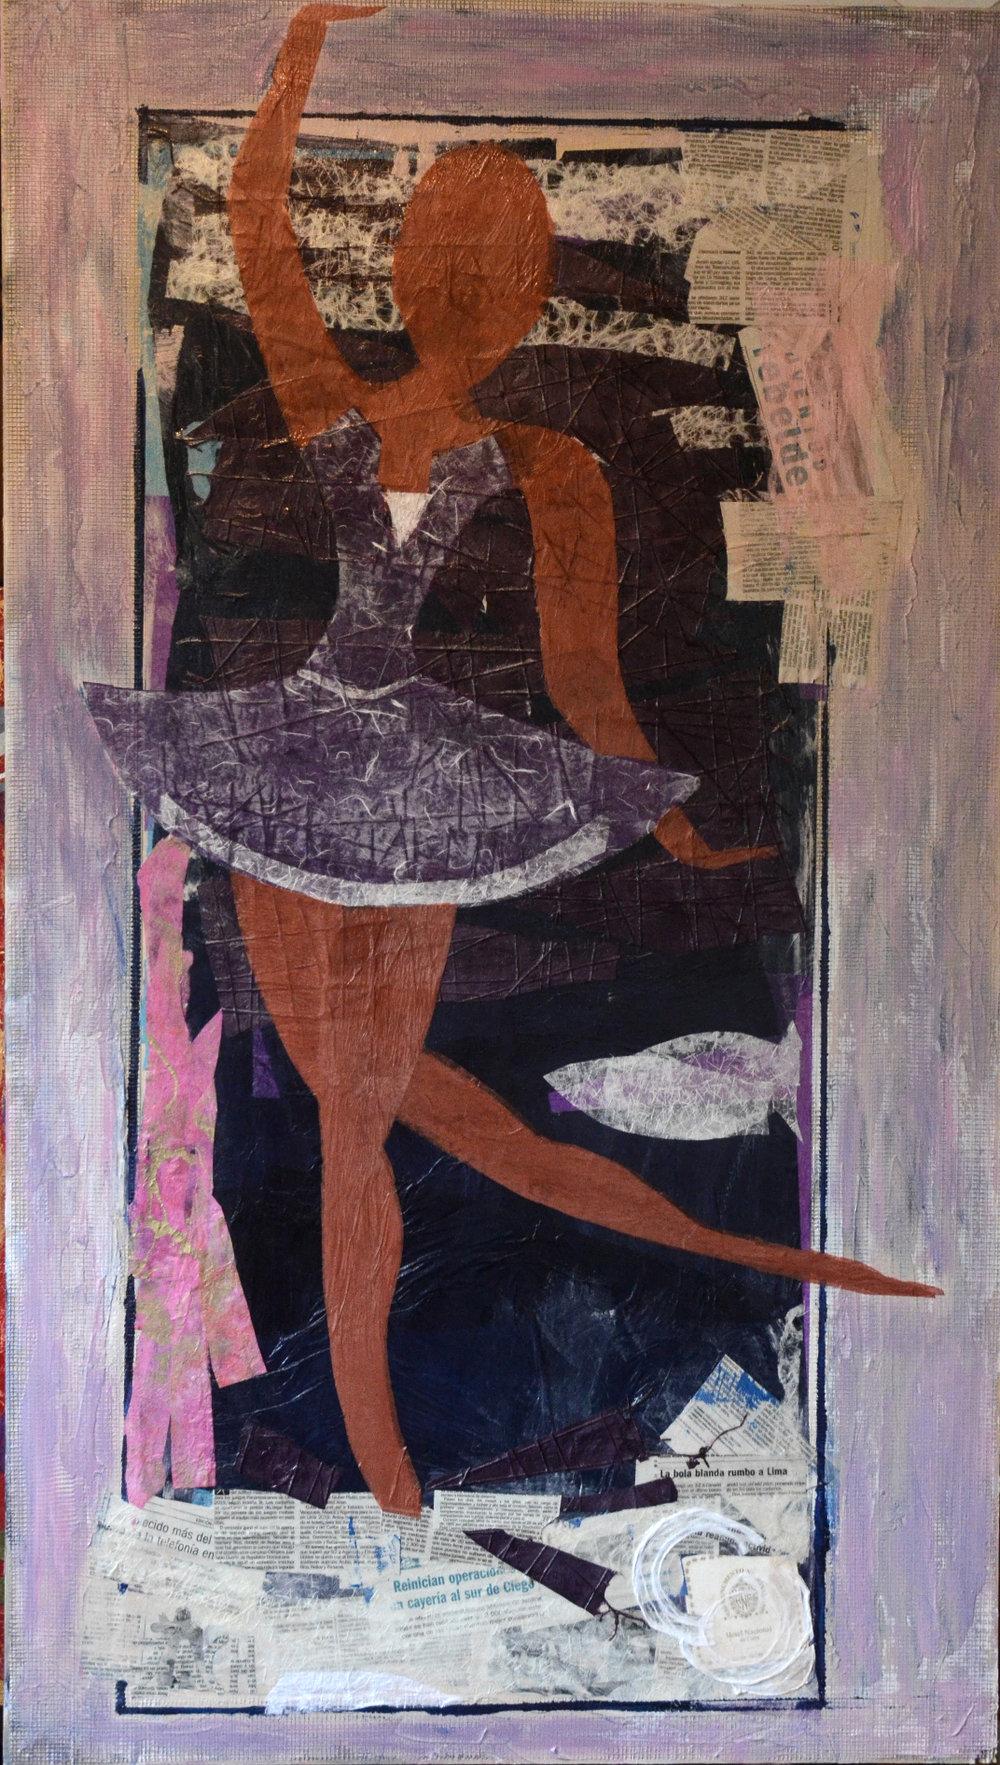 La Bailarina de la Habana